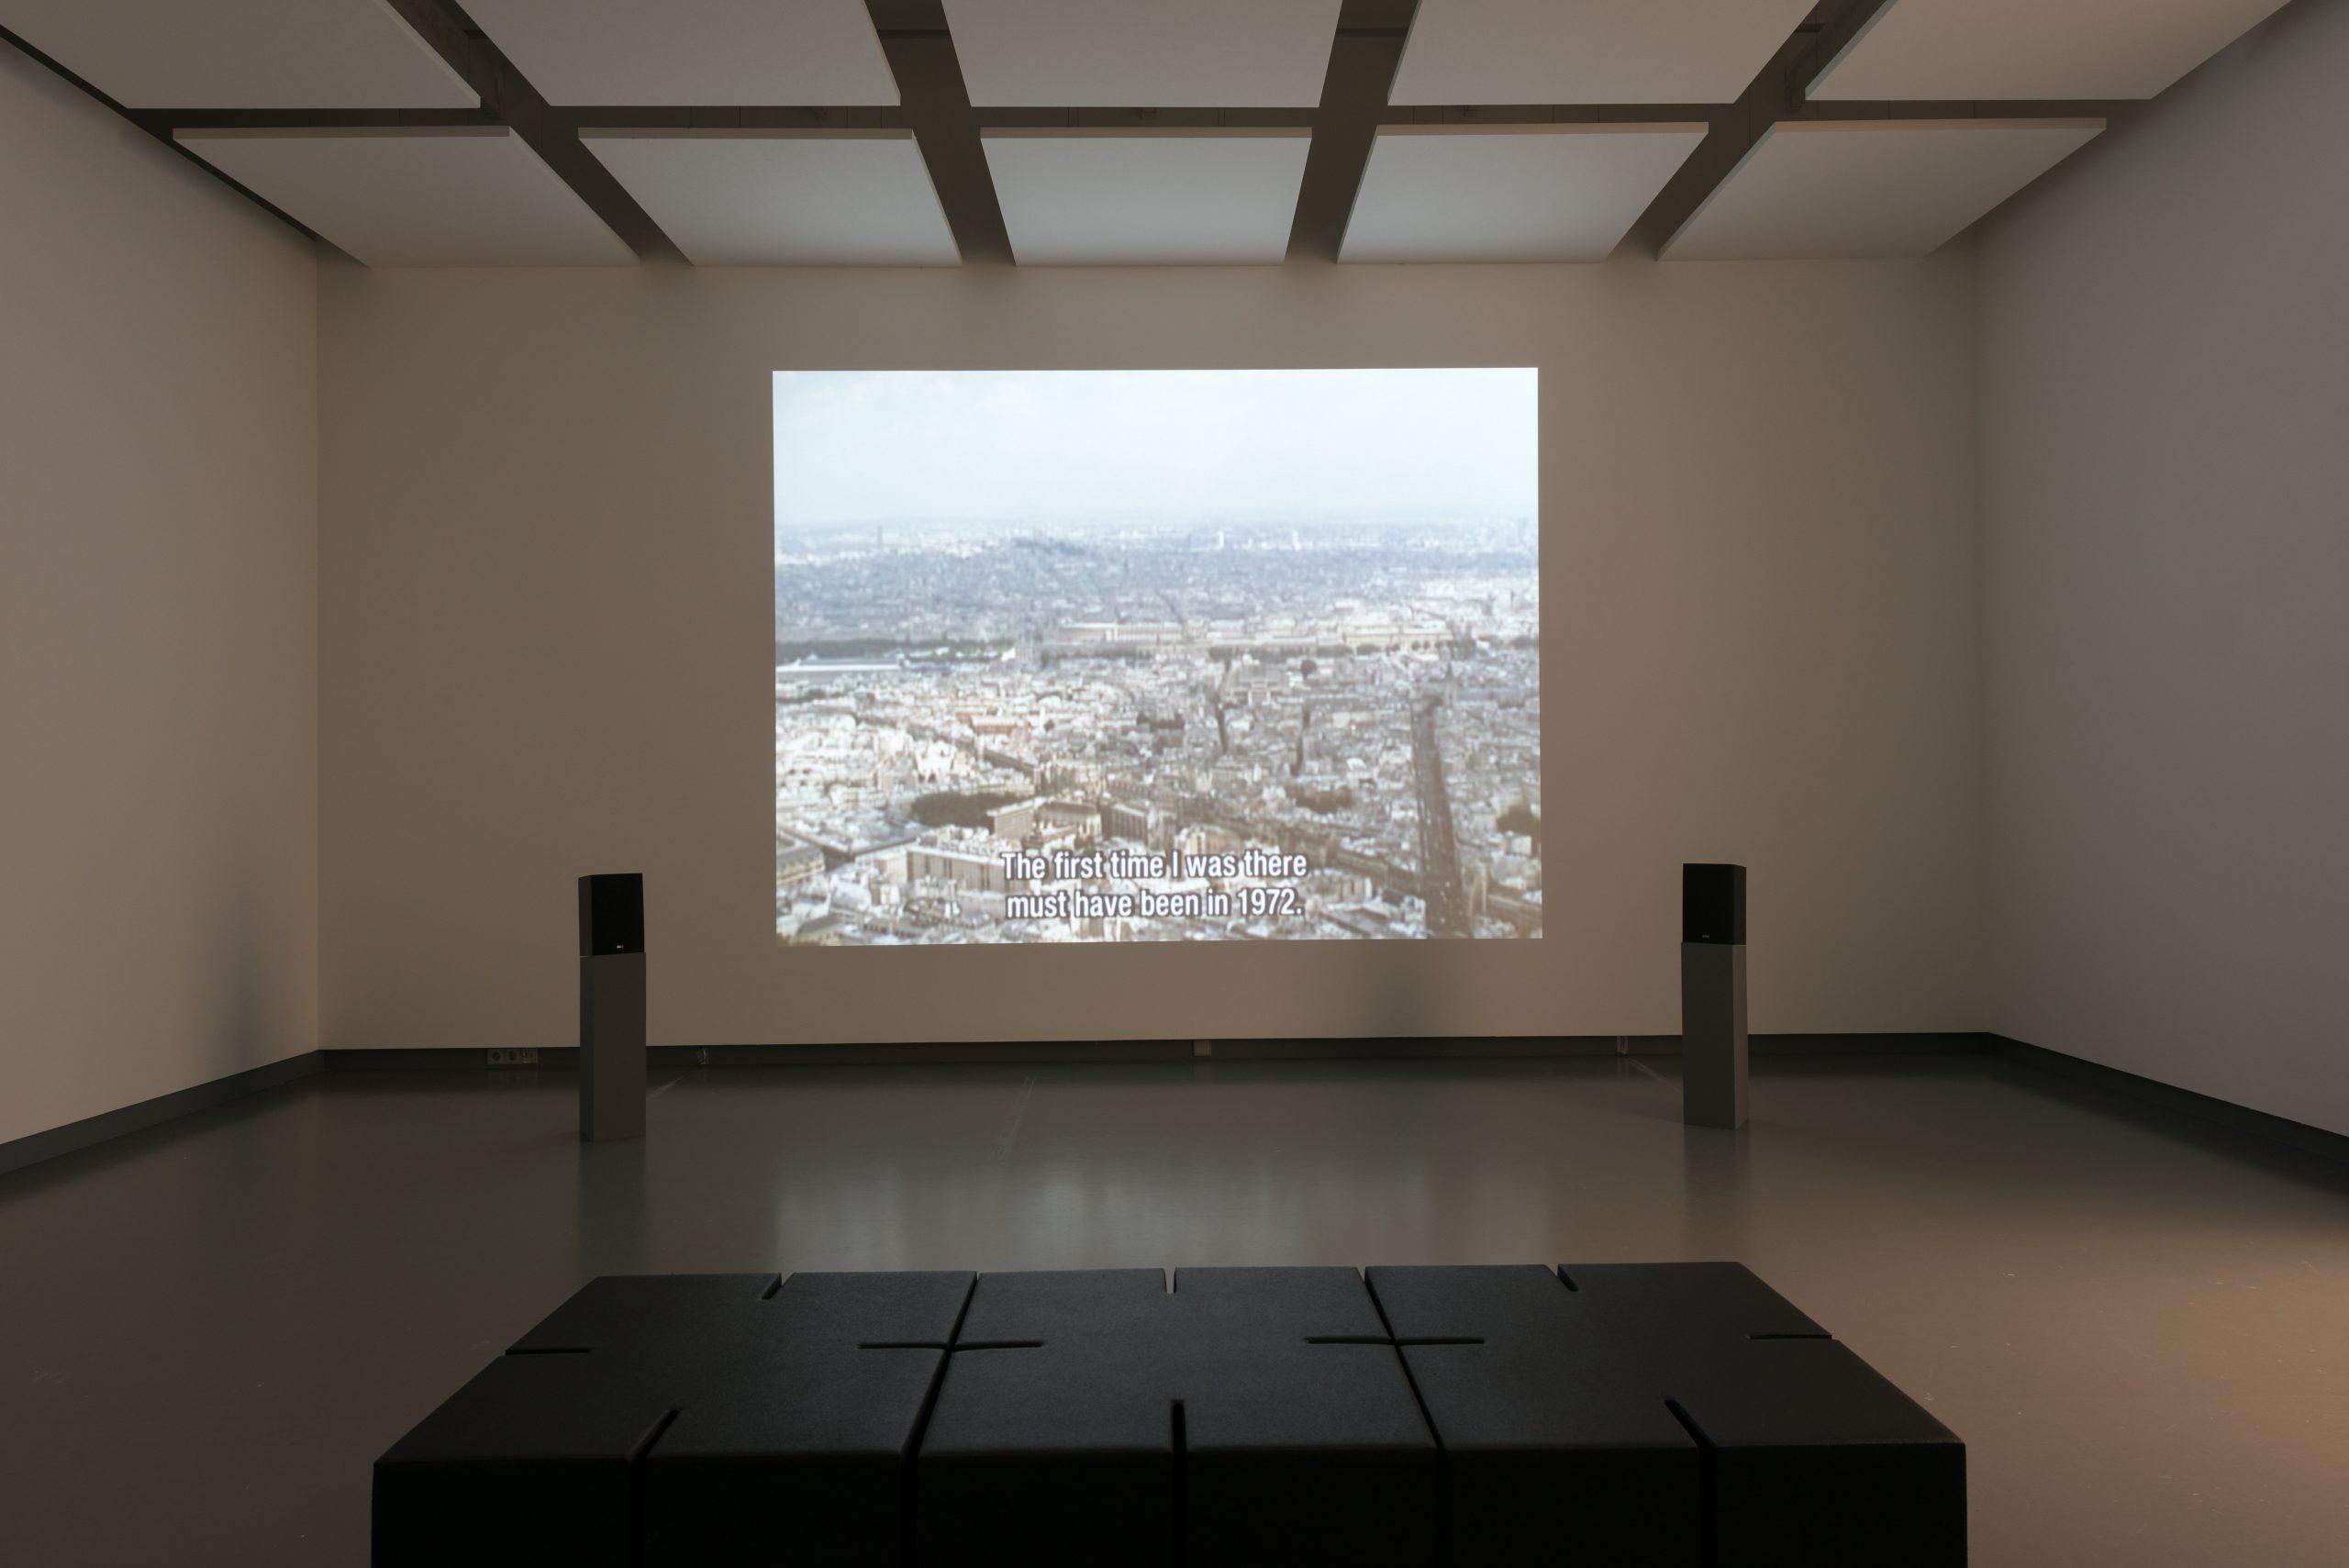 Manon de Boer at Van Abbemuseum, 2013